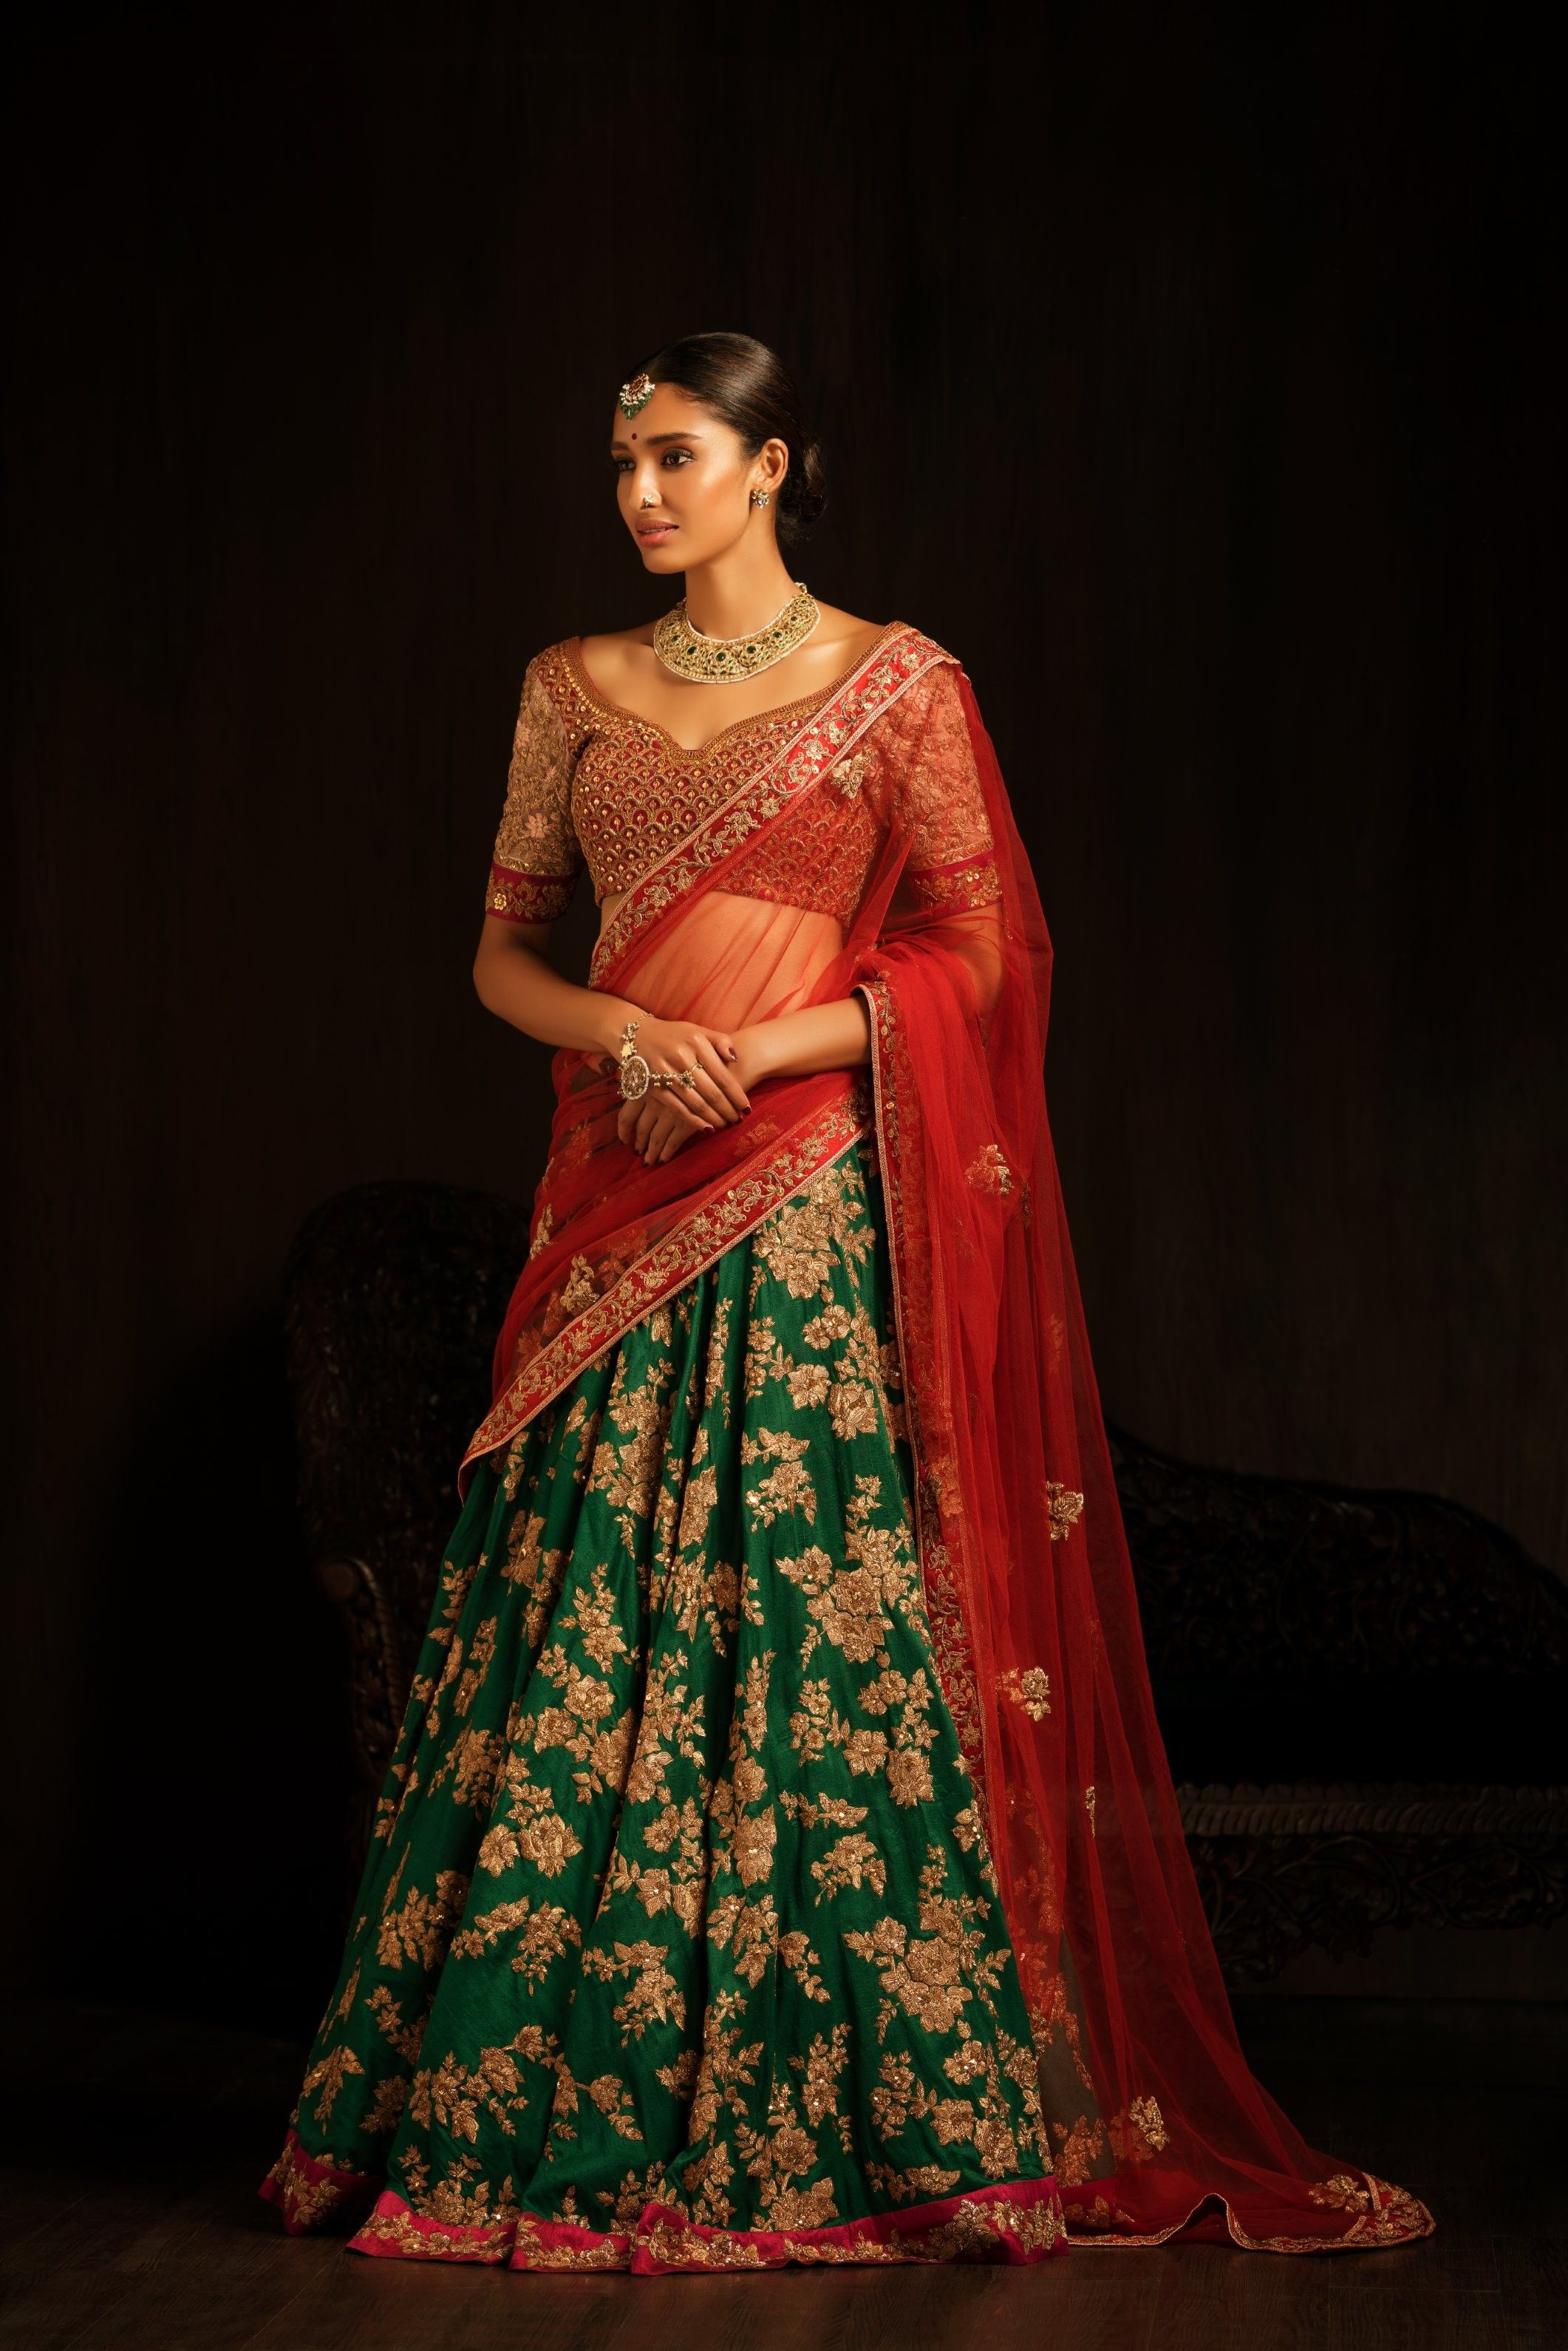 1411cfb54b Green Lehenga Choli, Net Lehenga Choli, $1,717.87. Buy latest Lengha choli  with custom stitching and worldwide shipping.